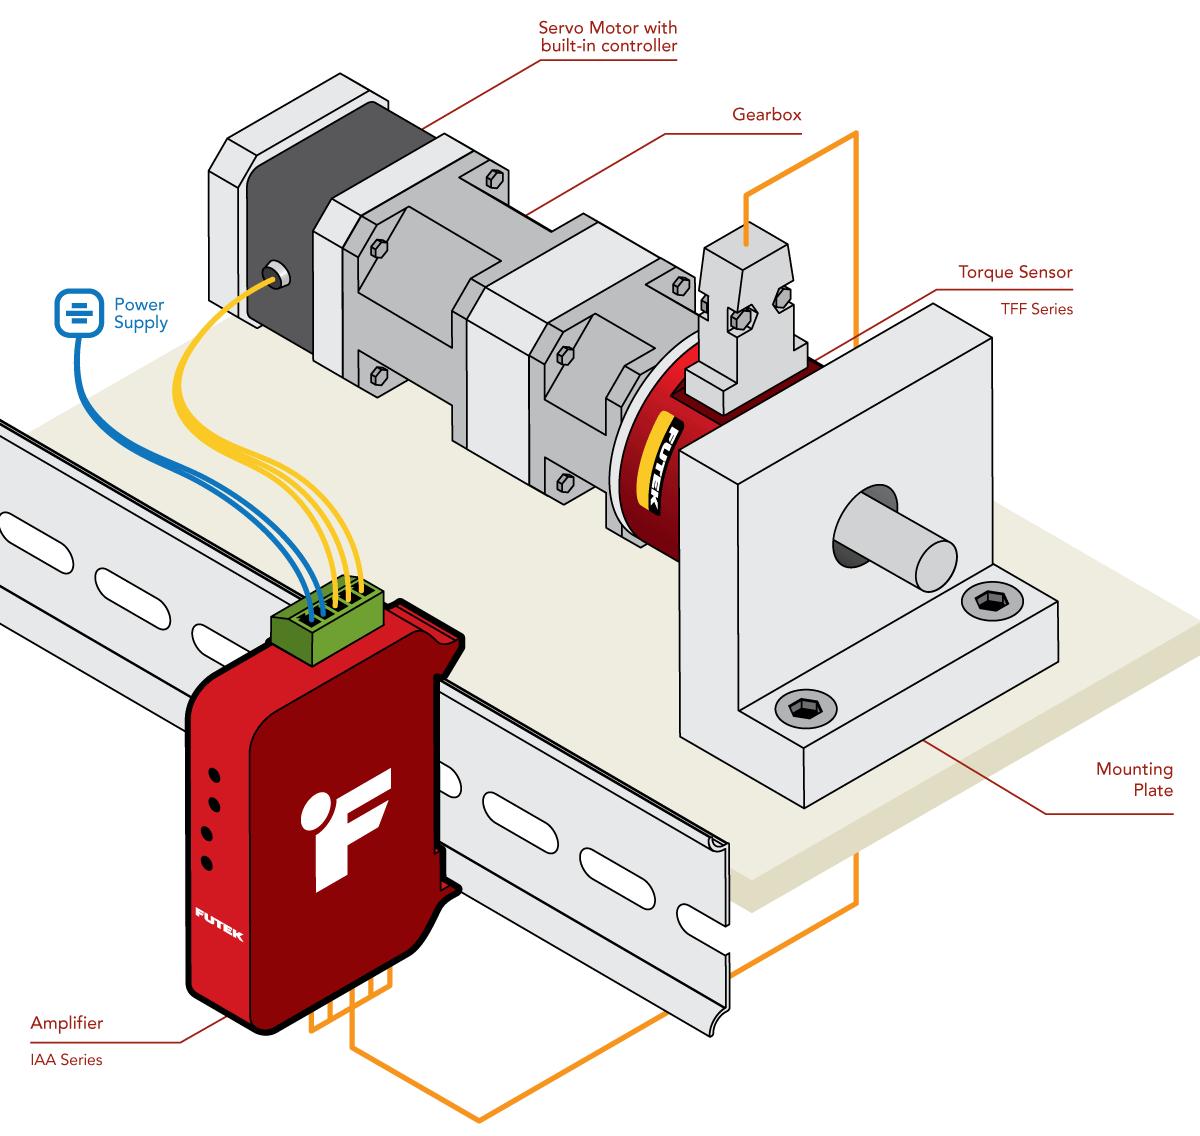 torque control of servo motor torque feedback control